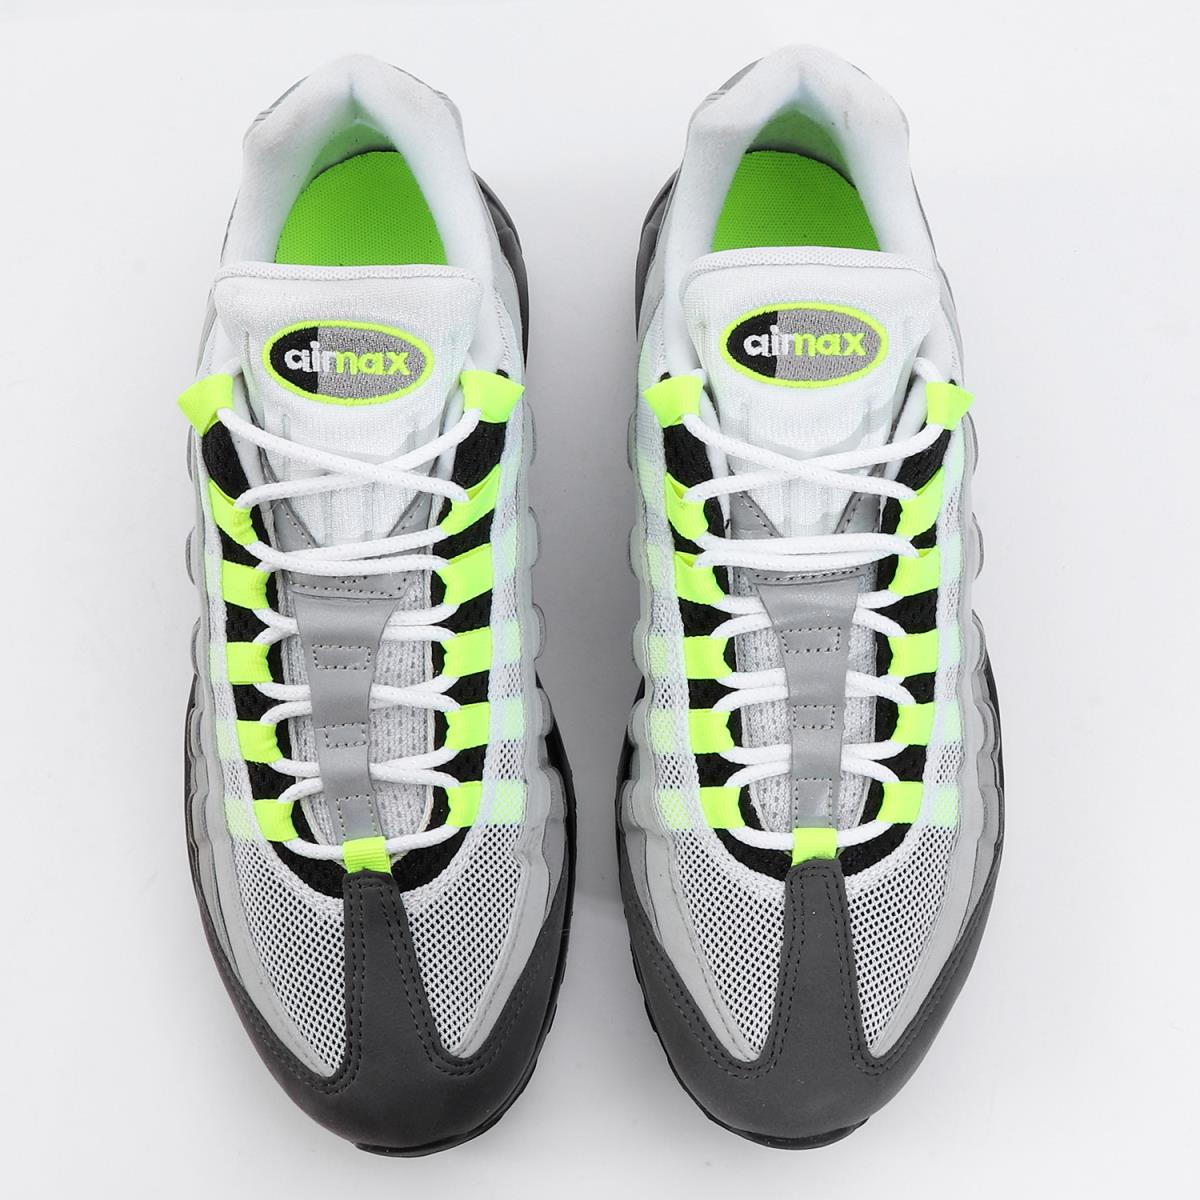 16ddbf8763c1 BEEGLE by Boo-Bee  NIKE (Nike) AIR MAX 95 OG VOLT NEON (  554